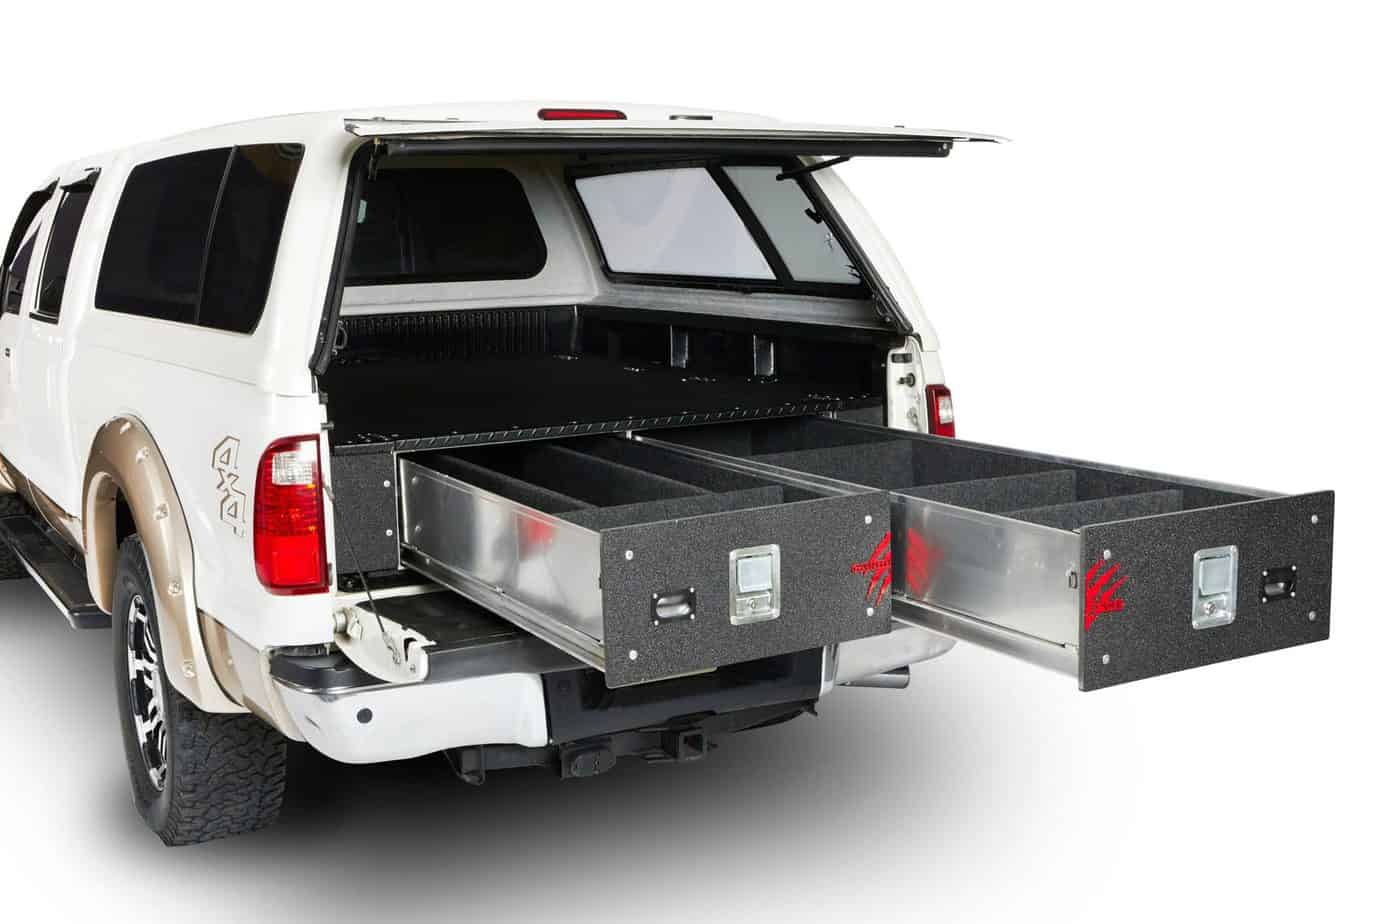 CargoEase drawers in truck open